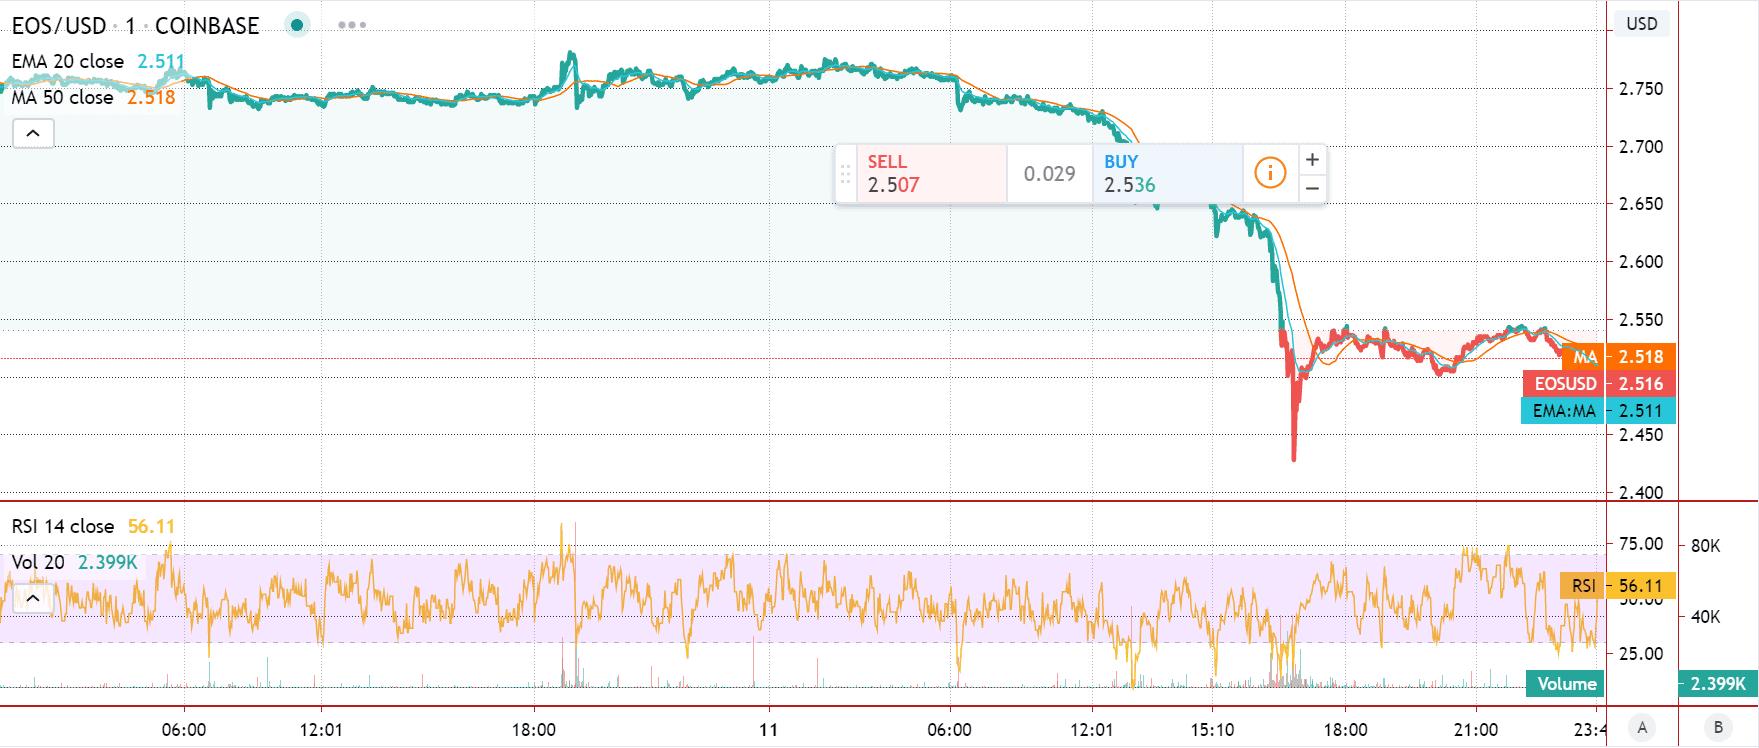 EOS price chart 2 - Jun11